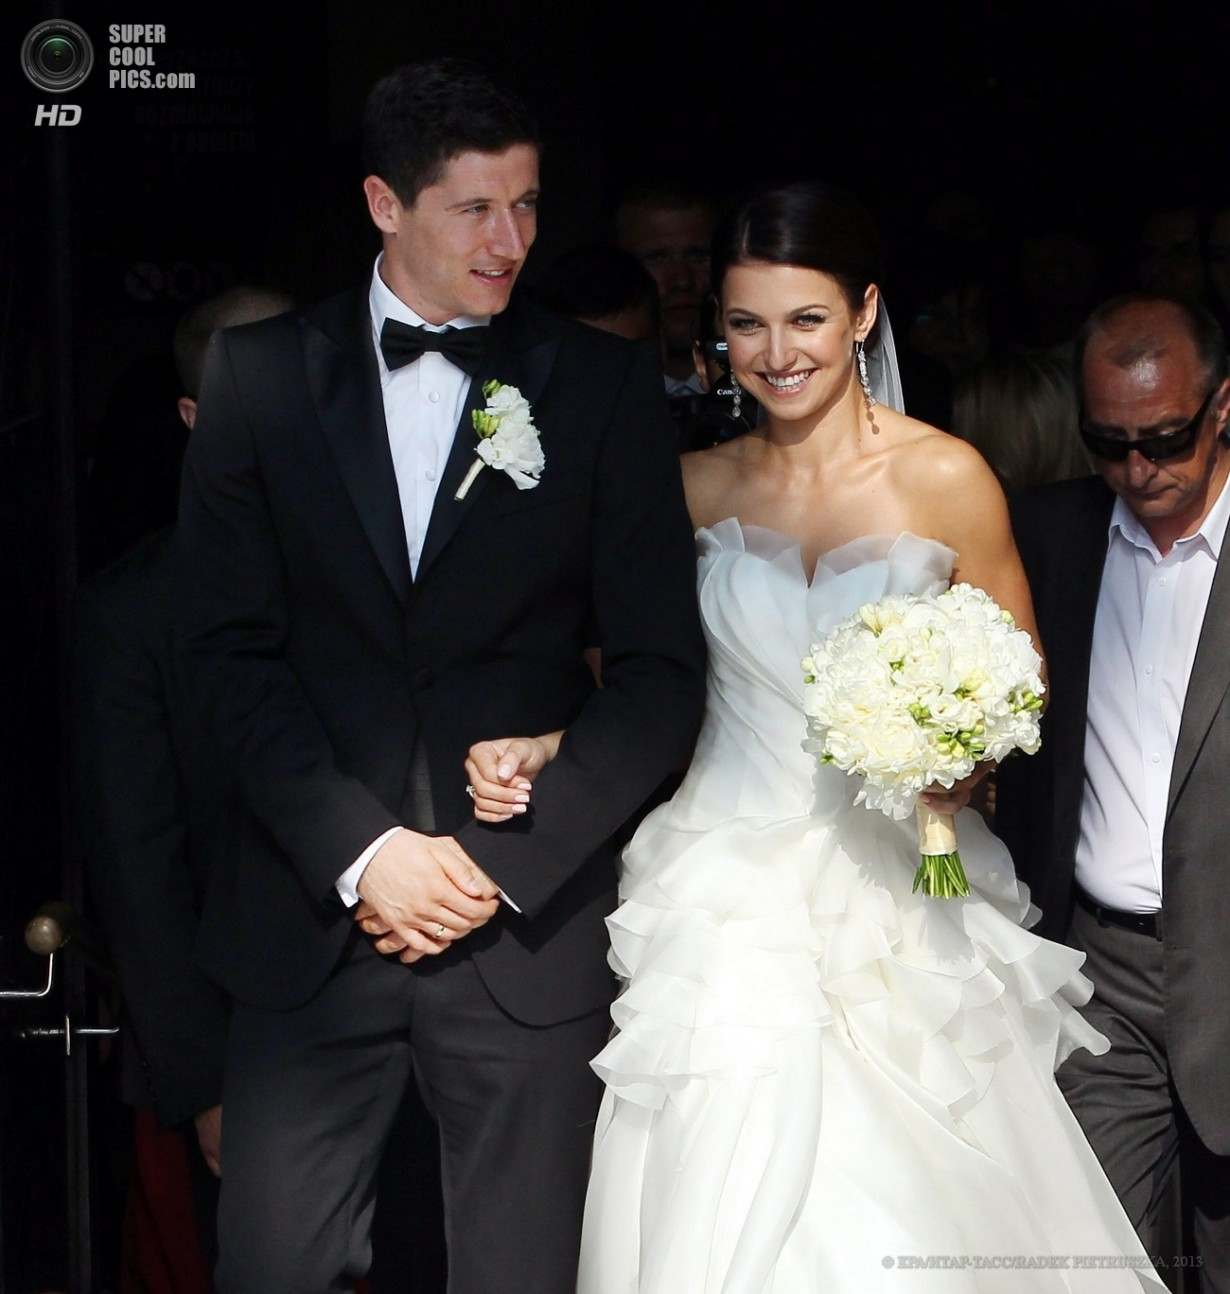 Роберт левандовски свадьба